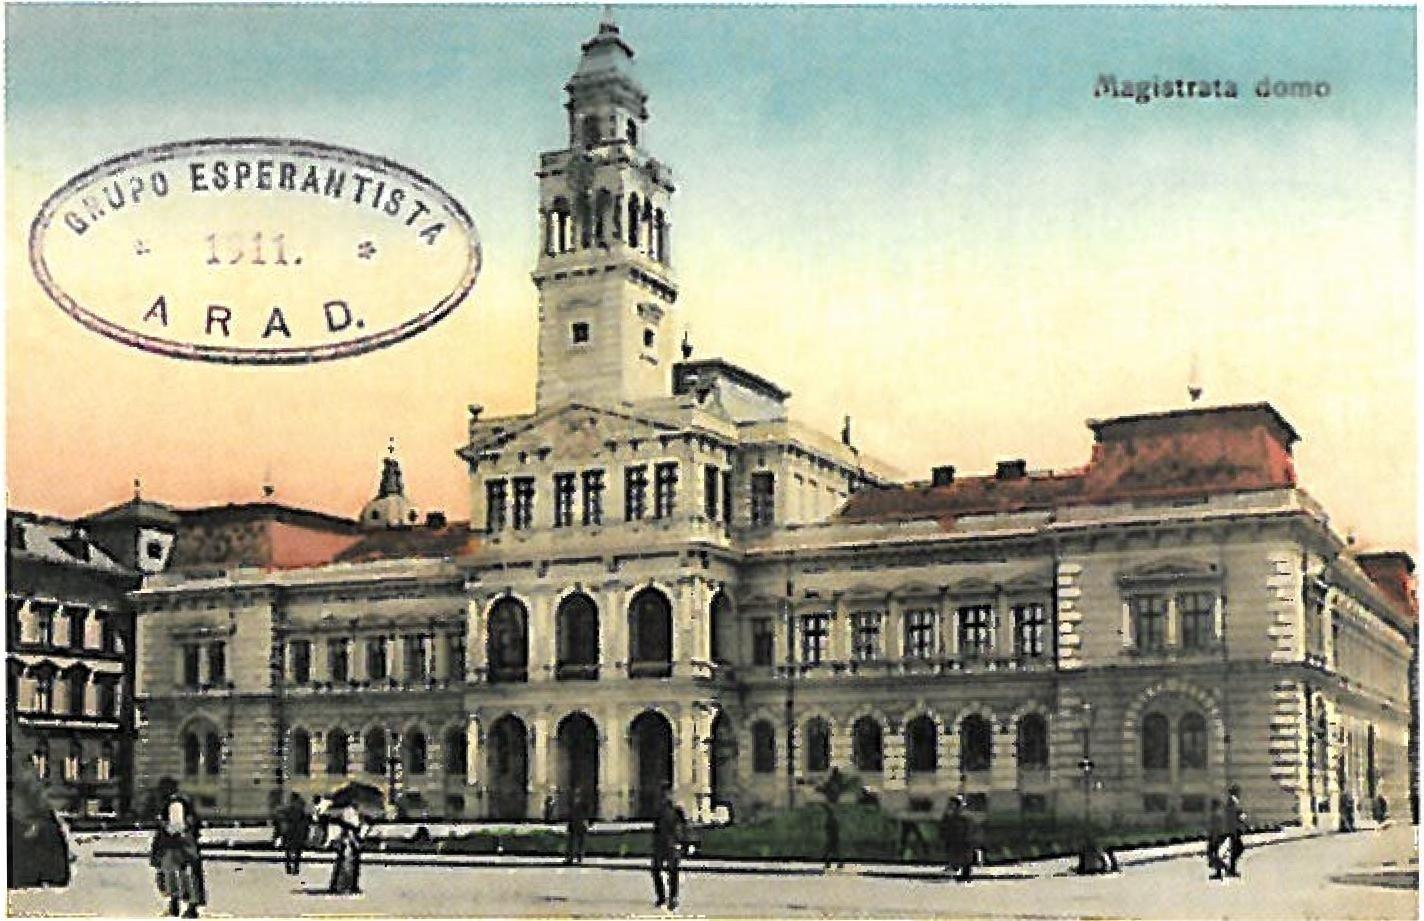 Primaria-Arad-Congres-Esperanto-1911